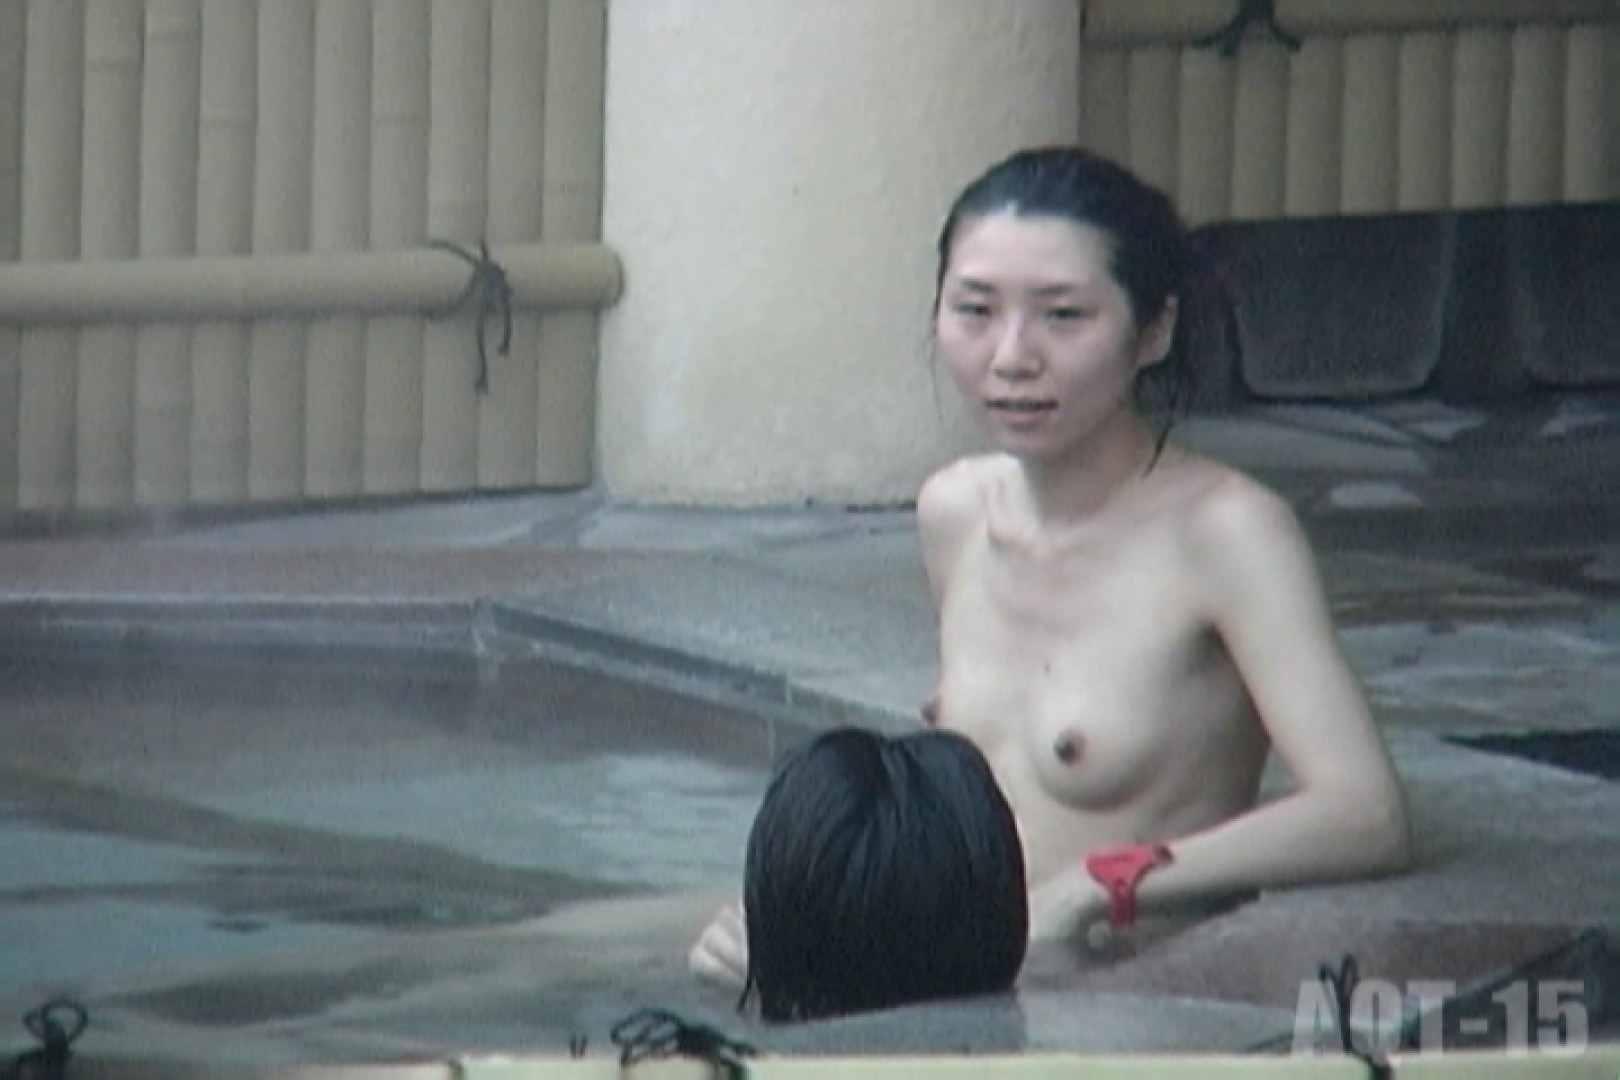 Aquaな露天風呂Vol.837 盗撮映像  107Pix 31